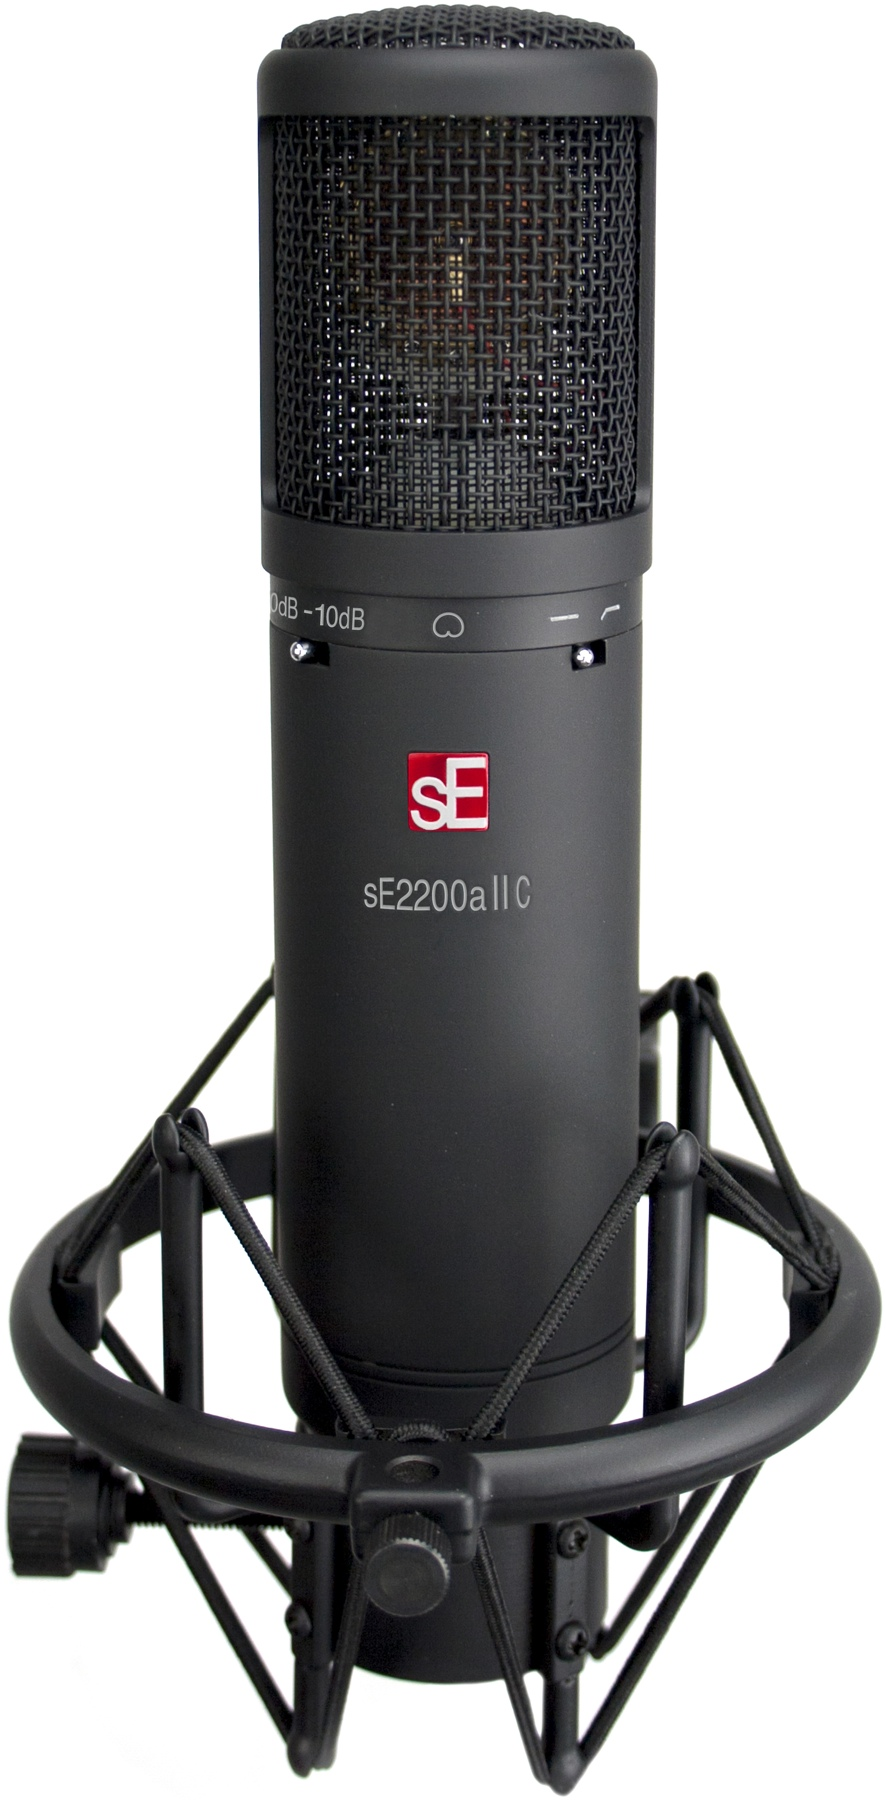 SE 2200a mkIIC